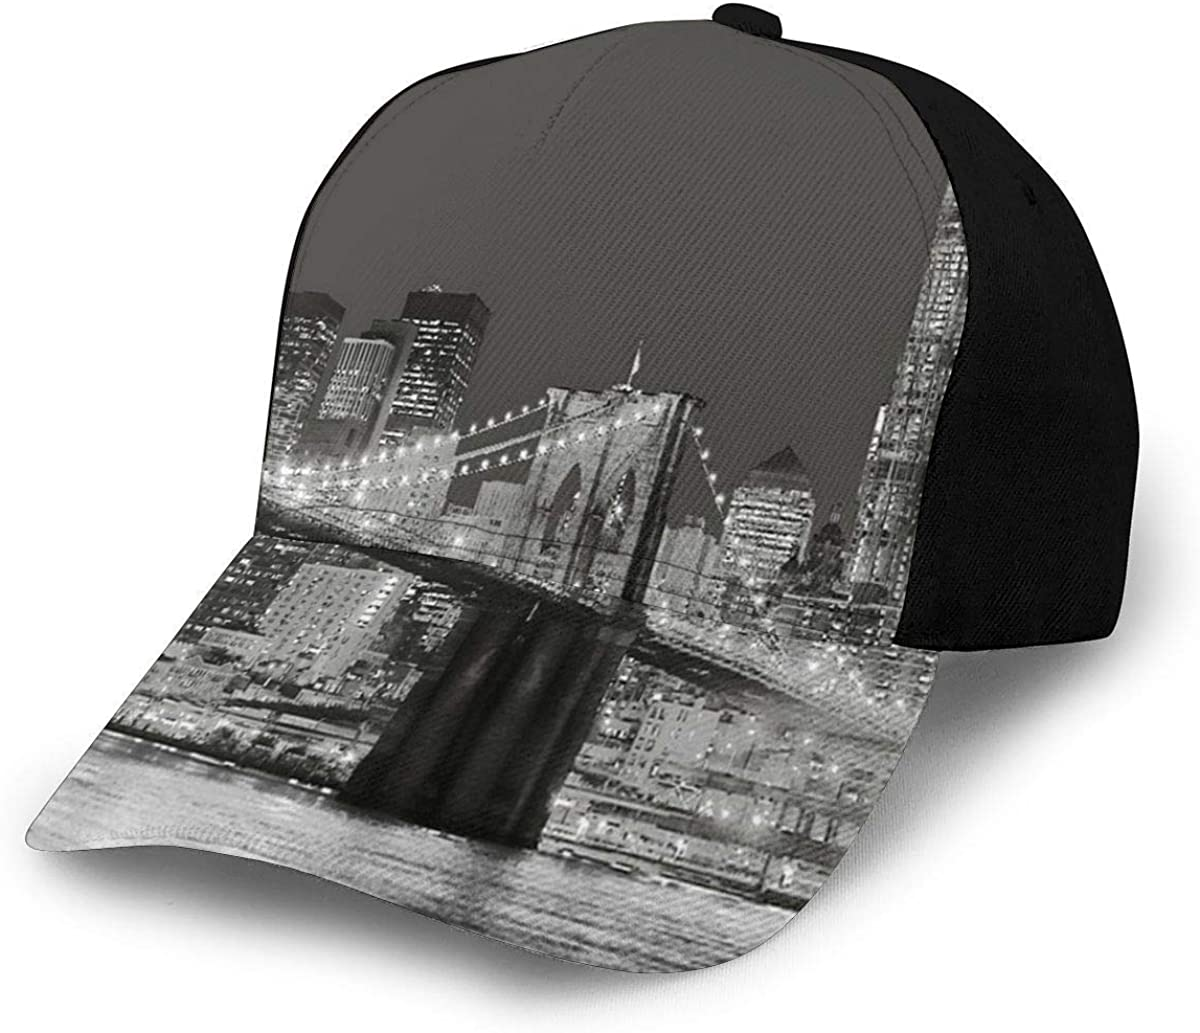 New York Brooklyn Bridge Lightweight Unisex Baseball Caps Adjustable Breathable Sun Hat for Sport Outdoor Black